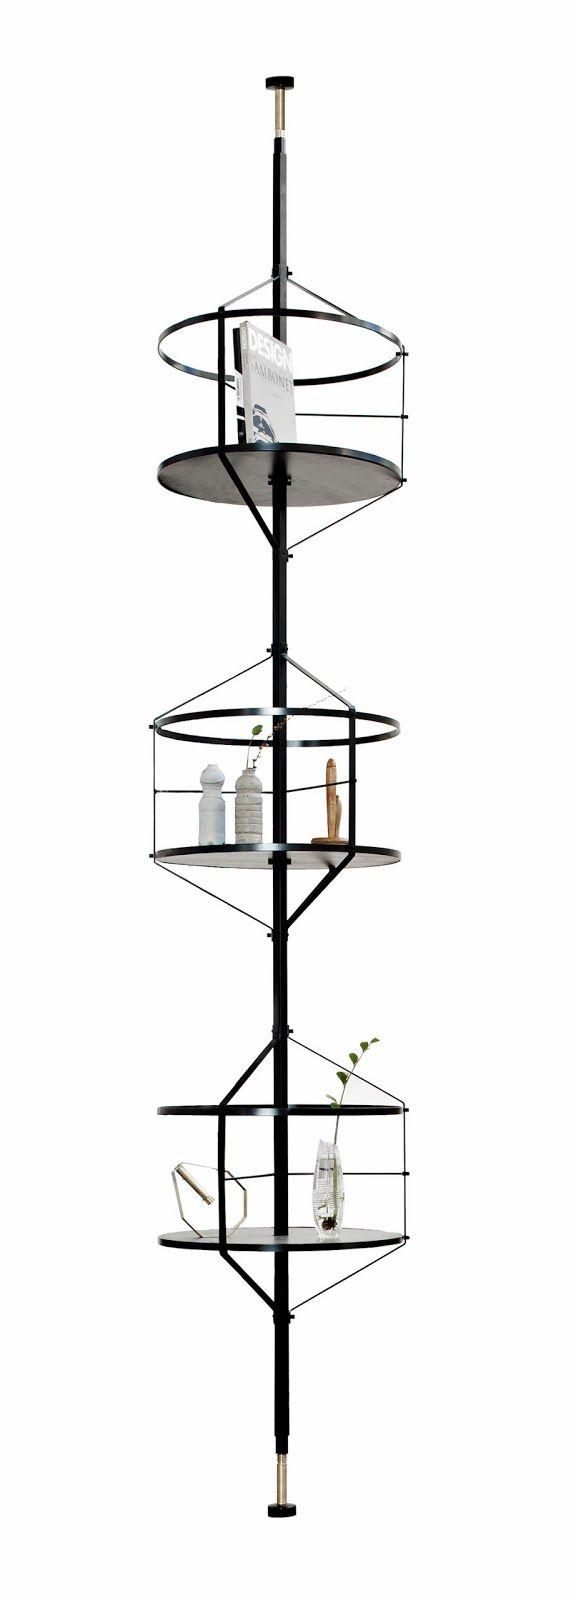 Shelves- Variazioni sul tema by Pietro Russo